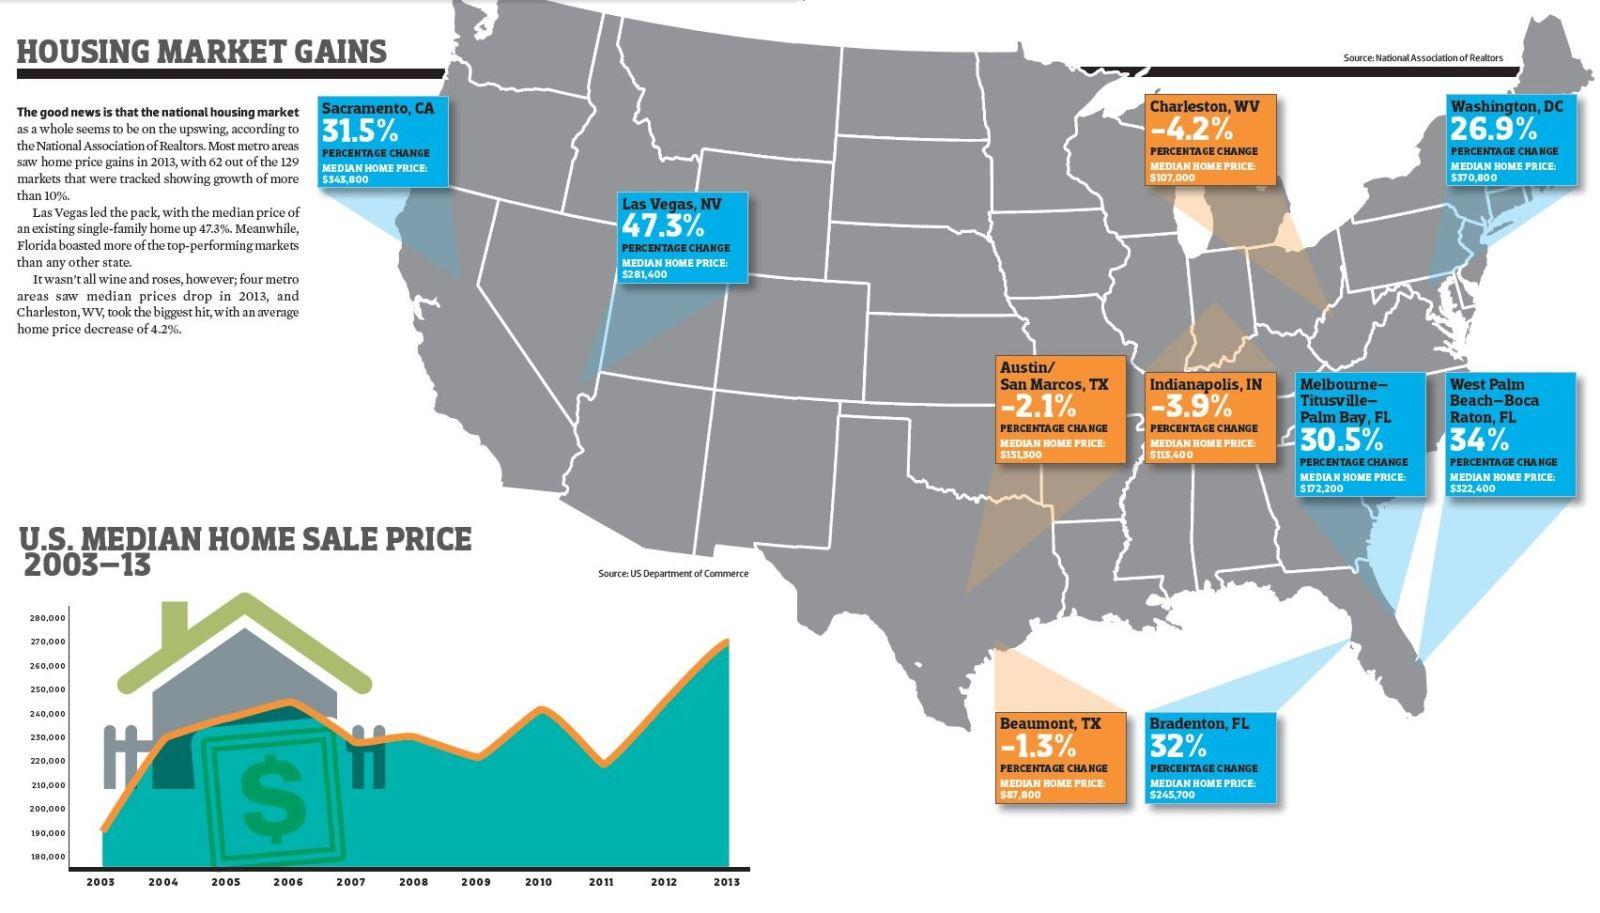 Housing Market Gains